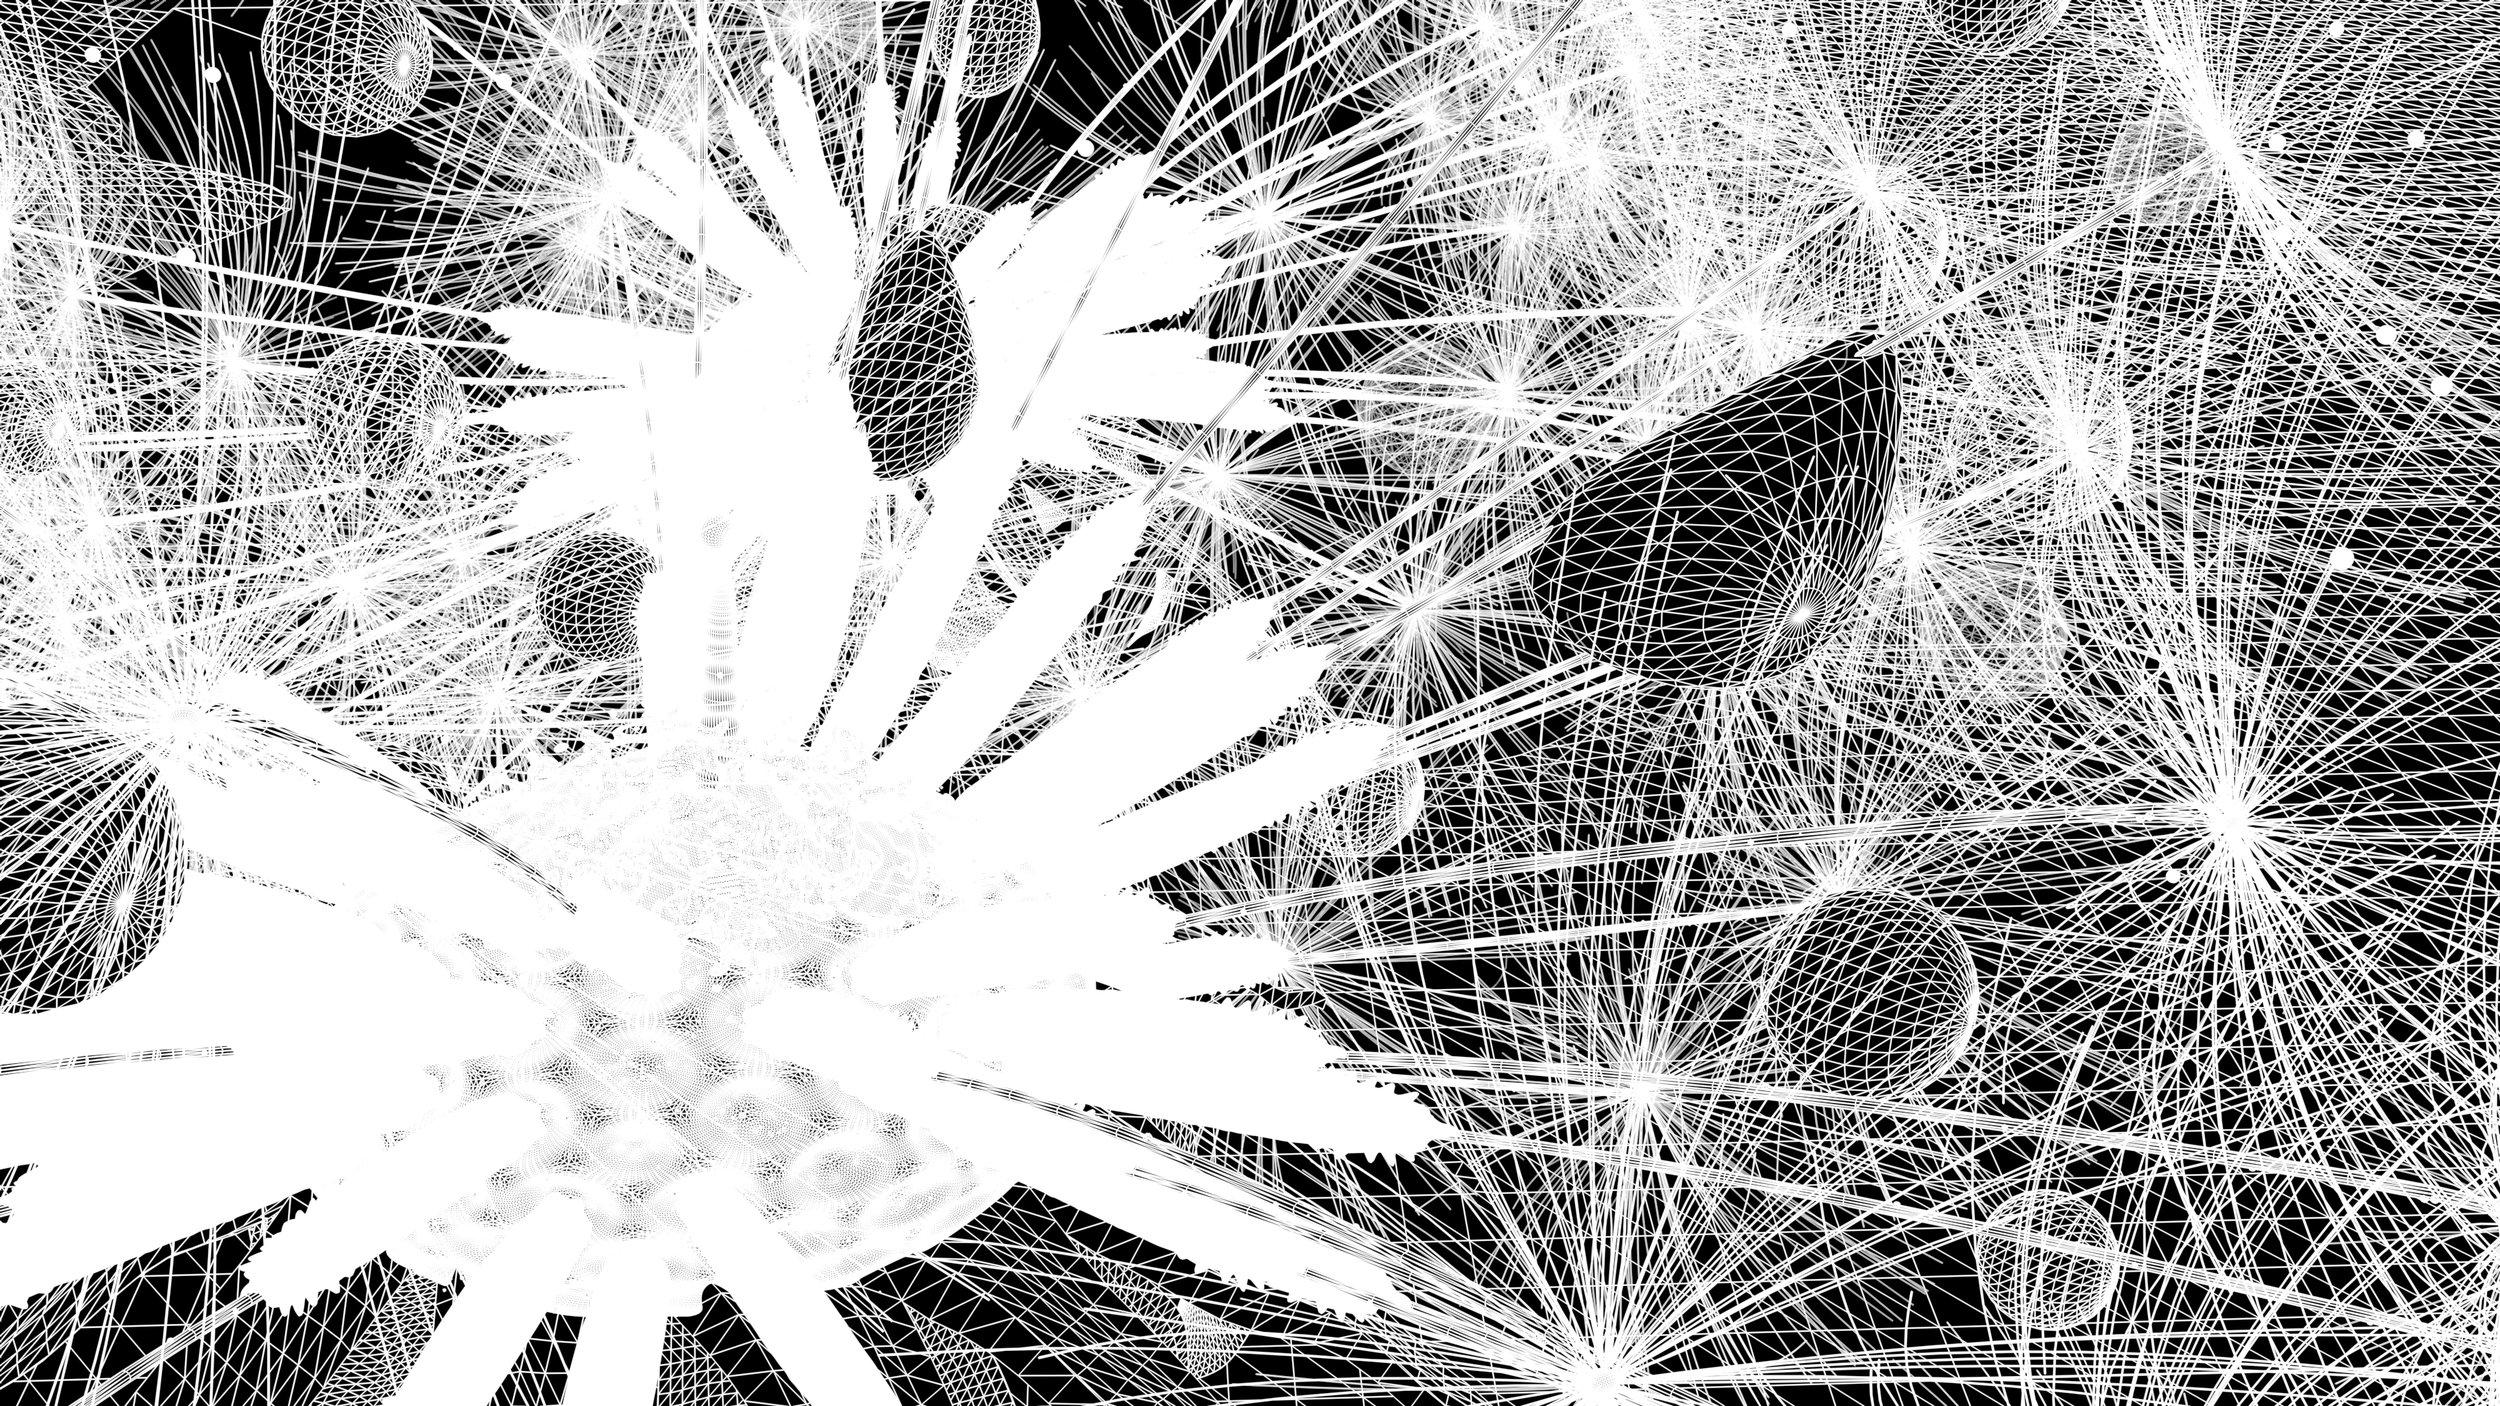 ALTSHIFT_Dandelion_wireframe.jpg